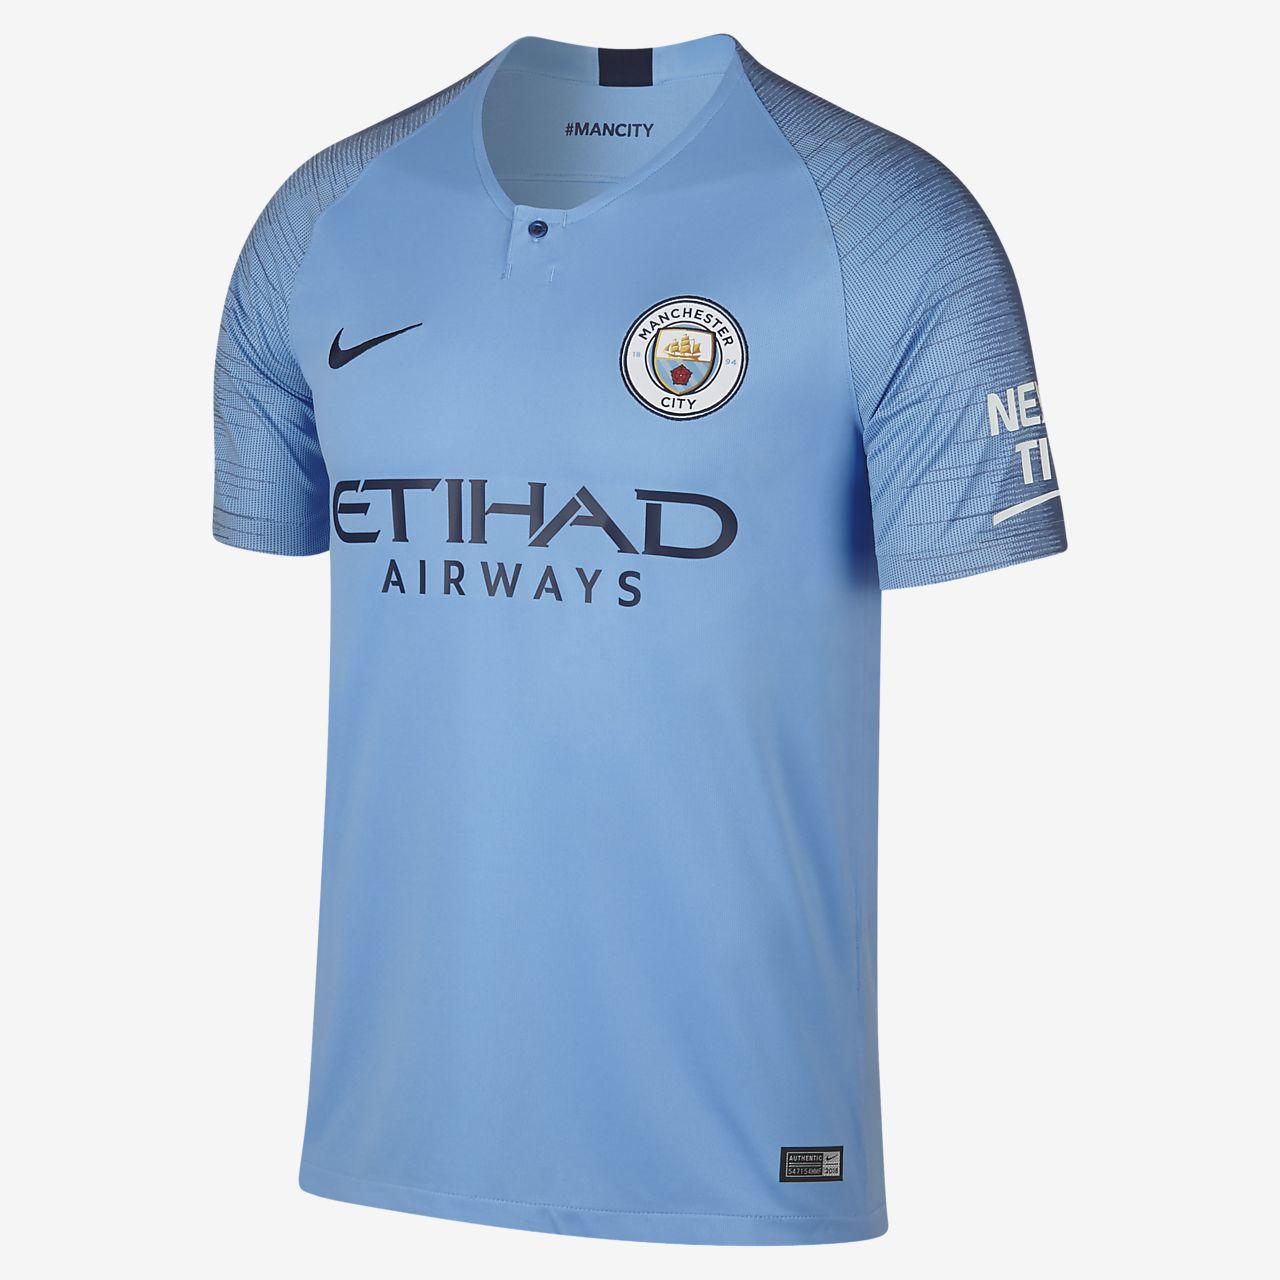 finest selection 84679 2c69f 2018/19 Manchester City FC Stadium Home Men's Football Shirt